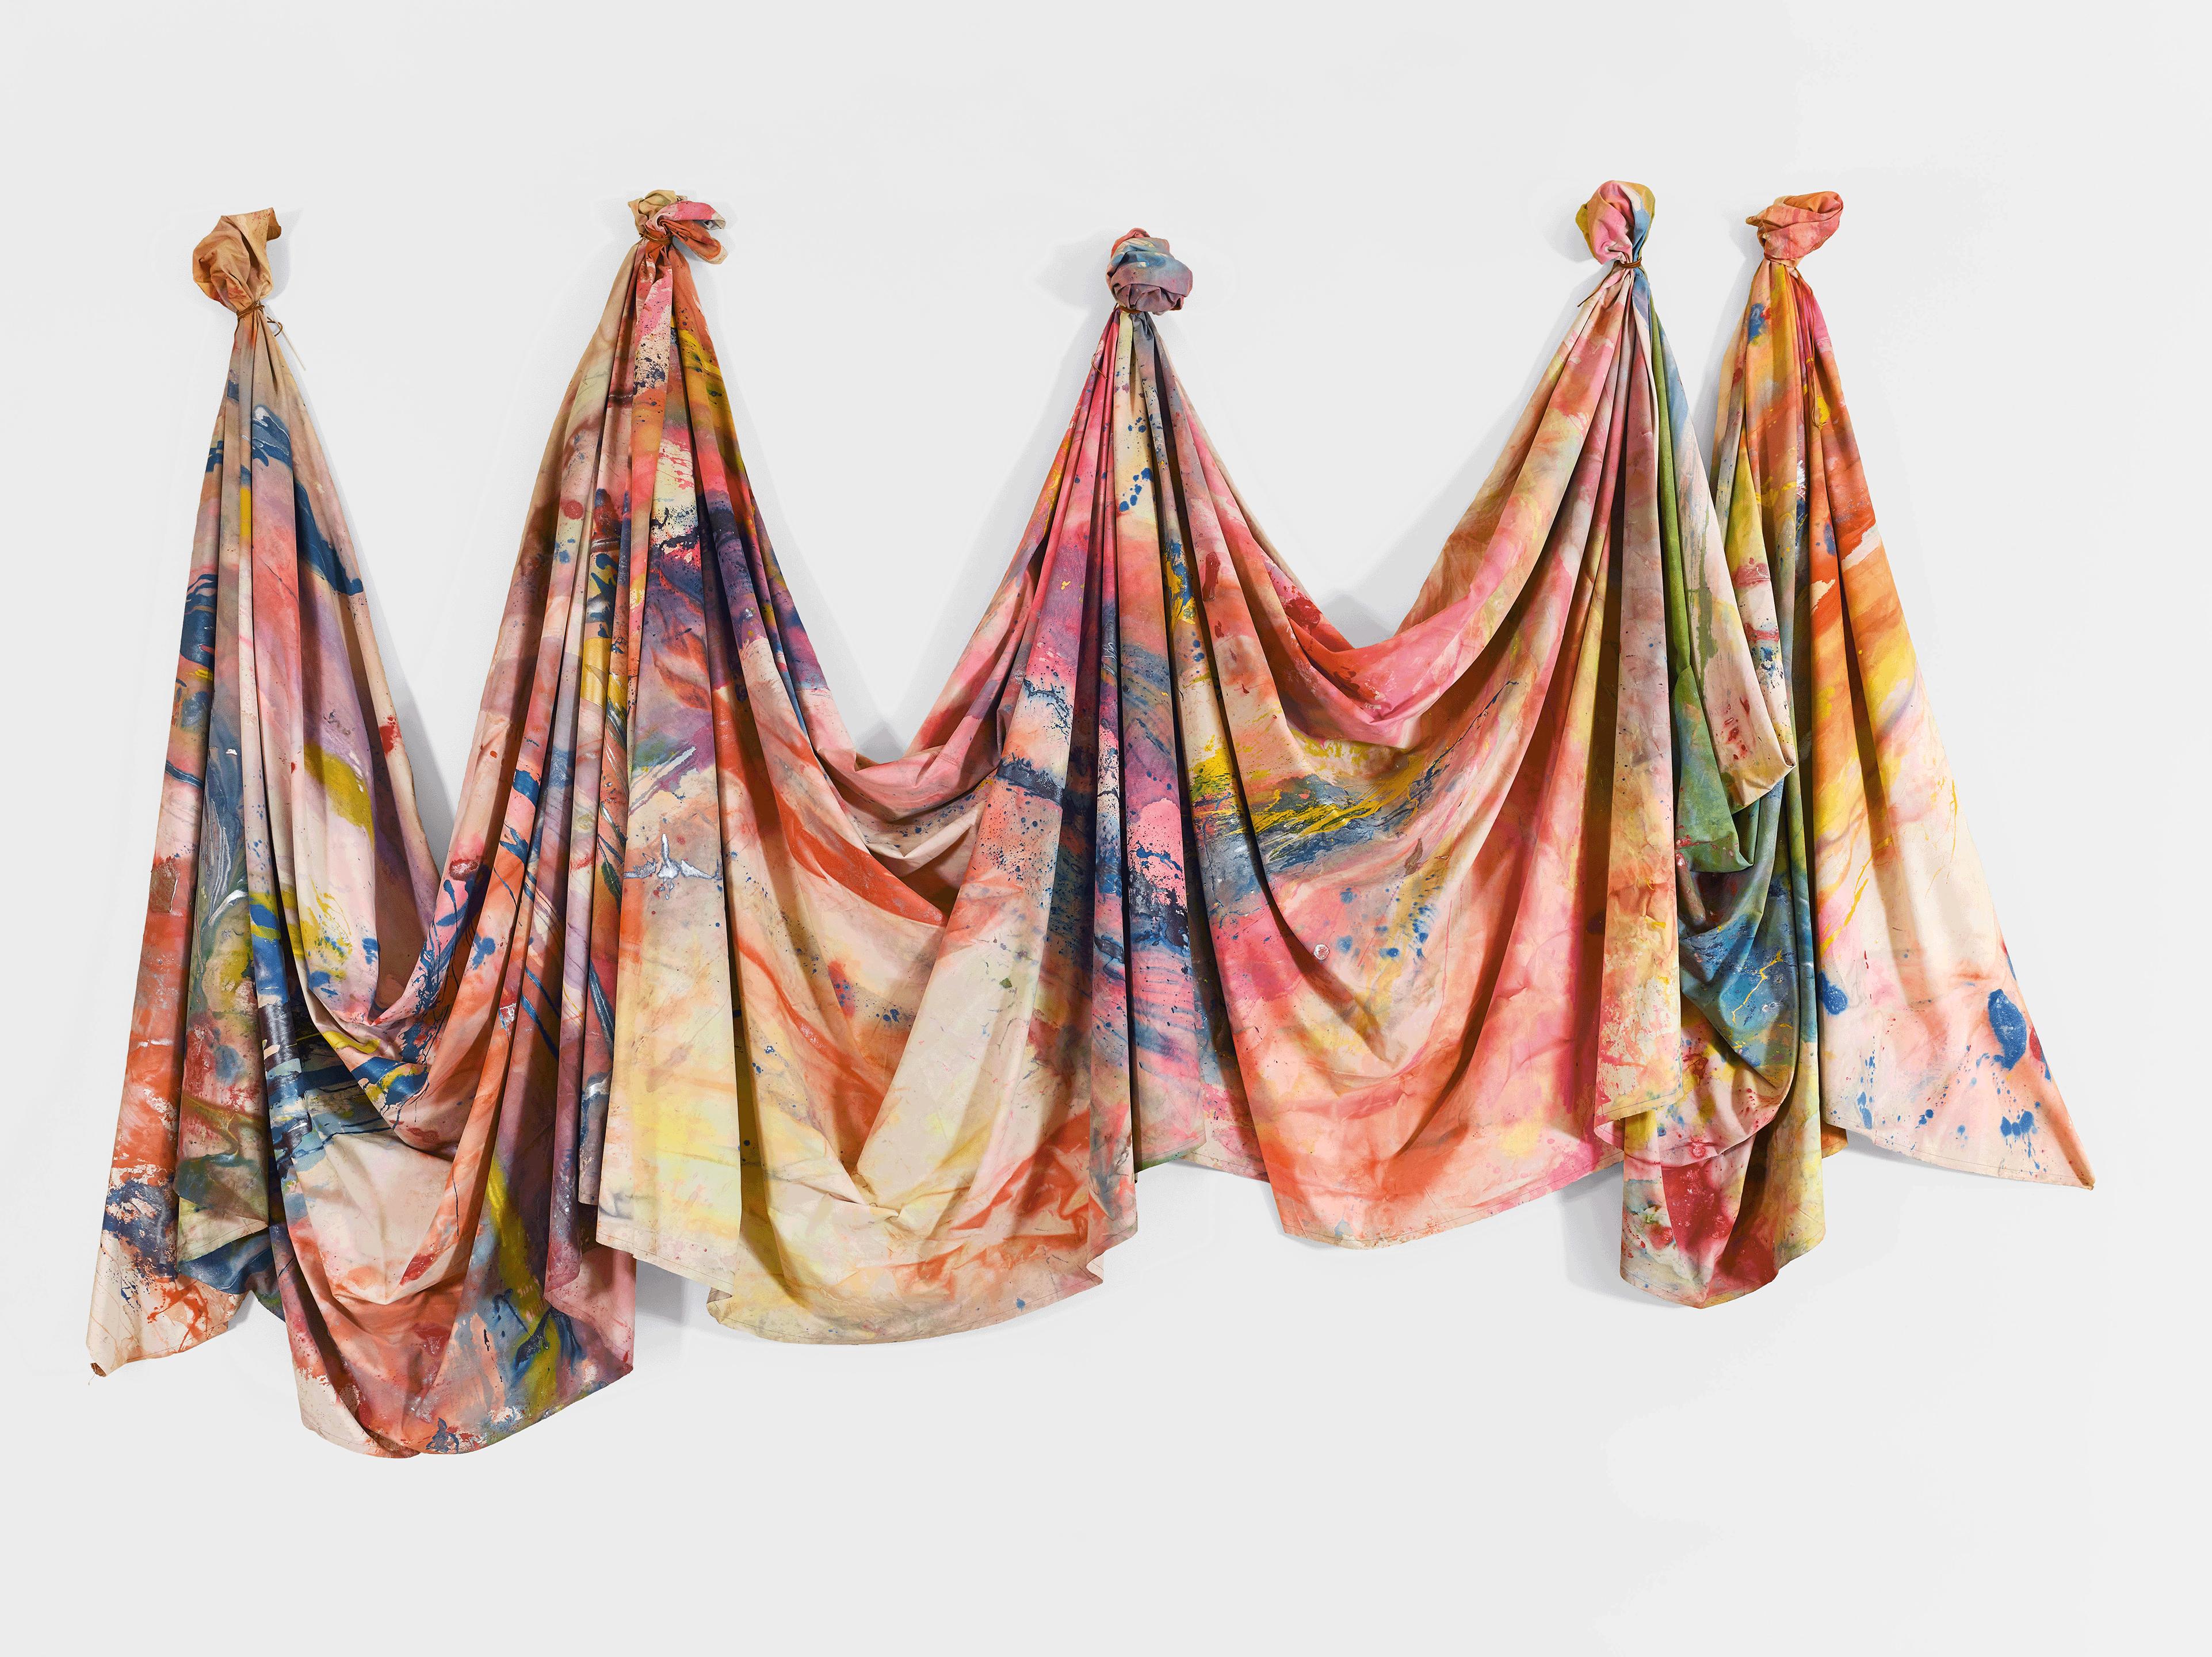 Carousel Change von Sam Gilliam, 1970, Tate. Promised gift of Pamela J. Joyner and Alfred J. Giuffrida (Tate Americas Foundation), Image courtesy David Kordansky Gallery